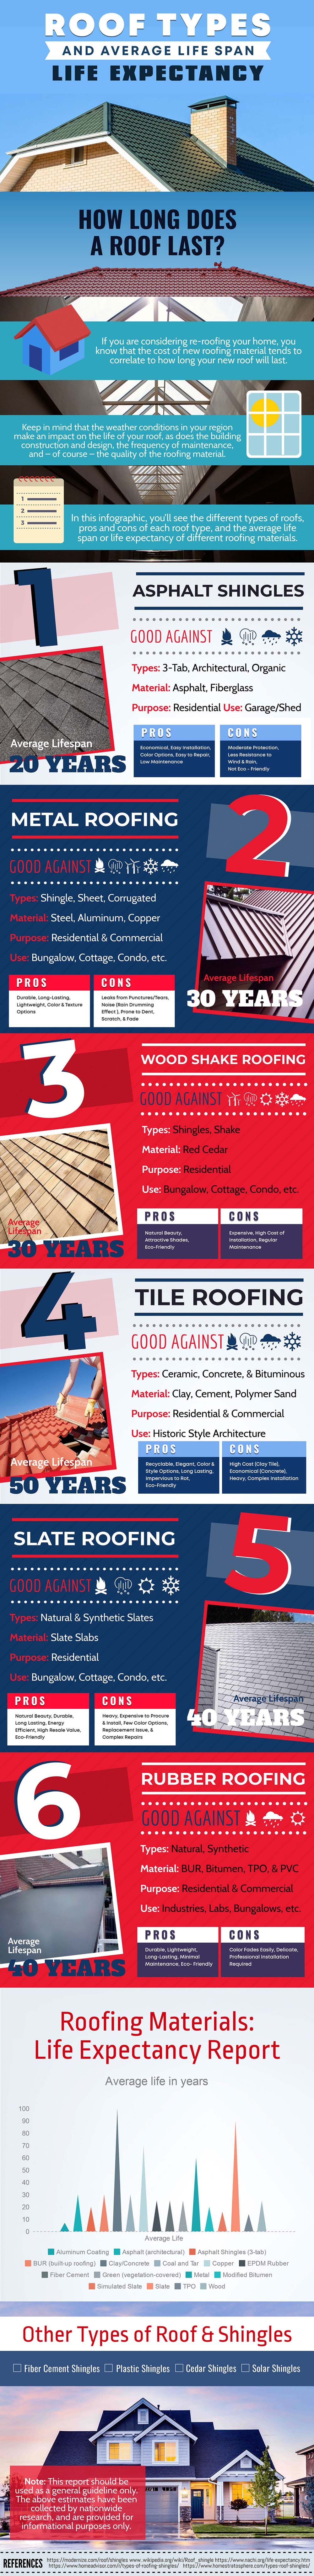 Roof Types & Average Life Span